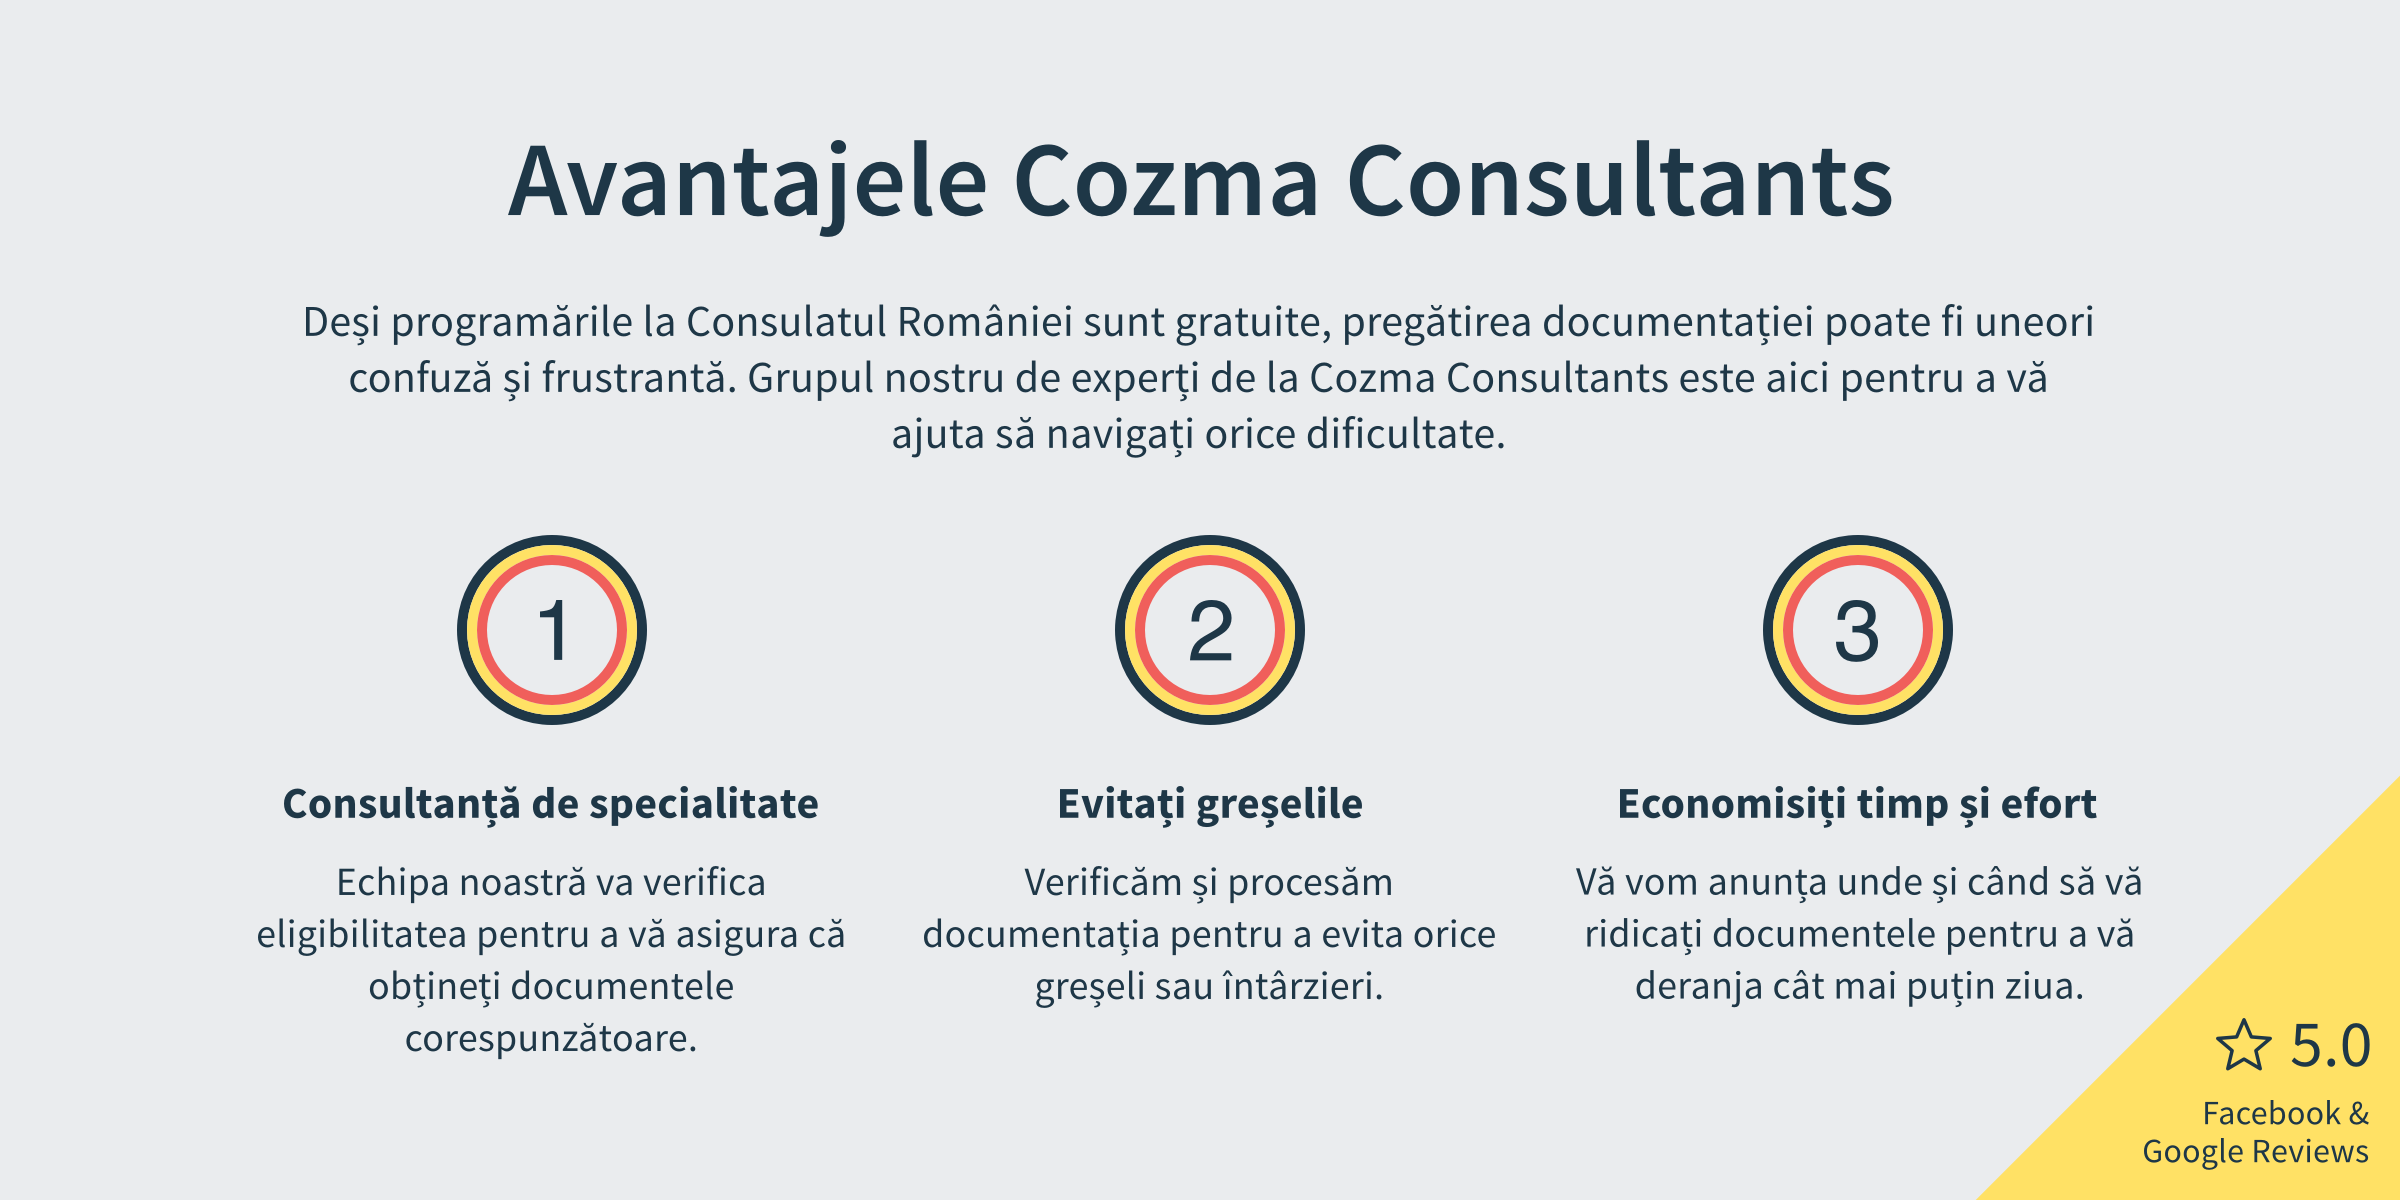 Avantajele Cozma Consultants